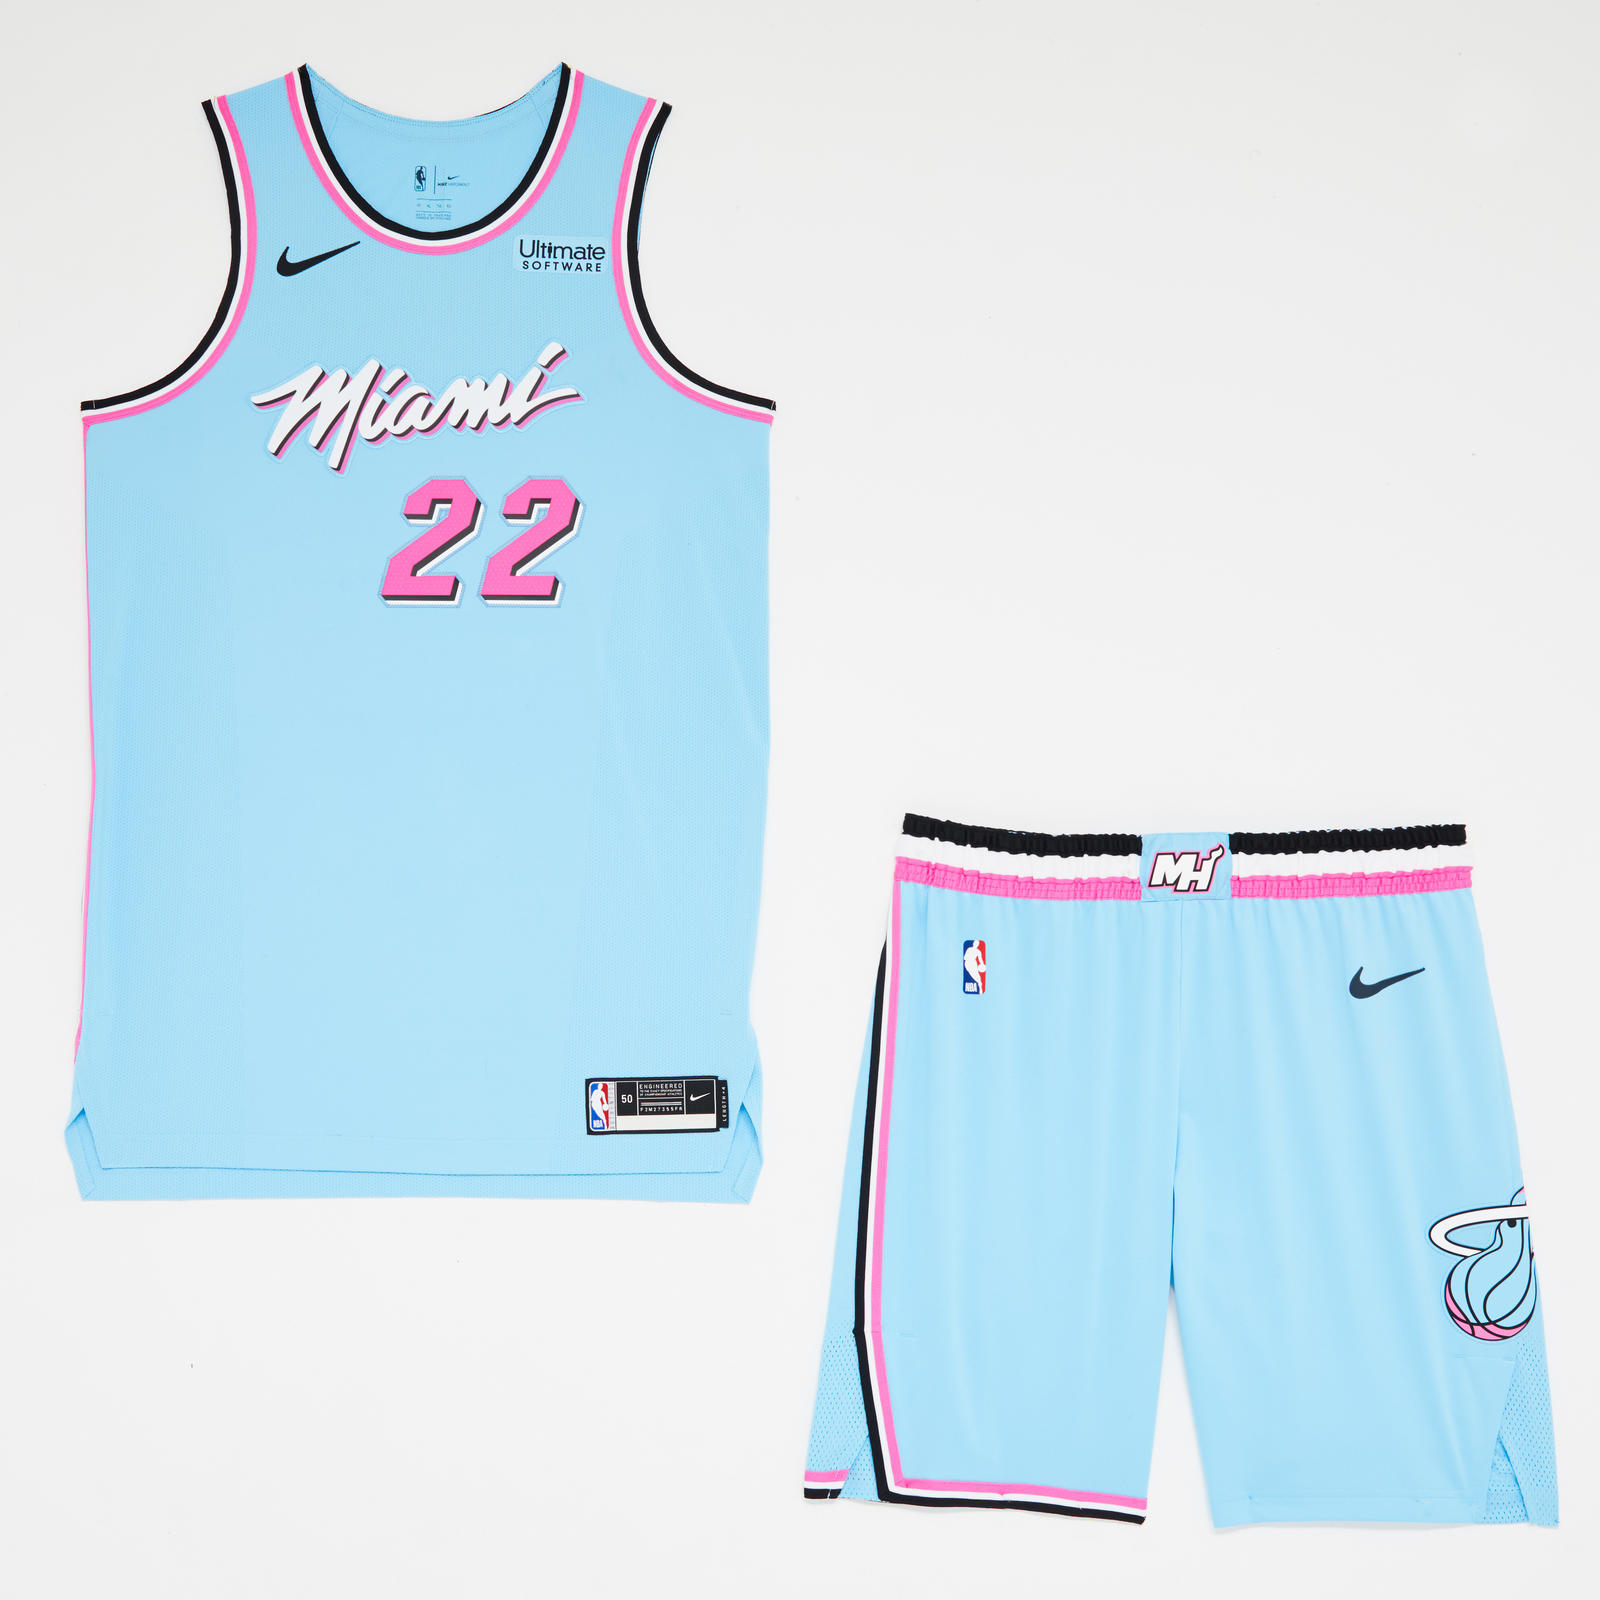 Miami Heat Vice City Edition